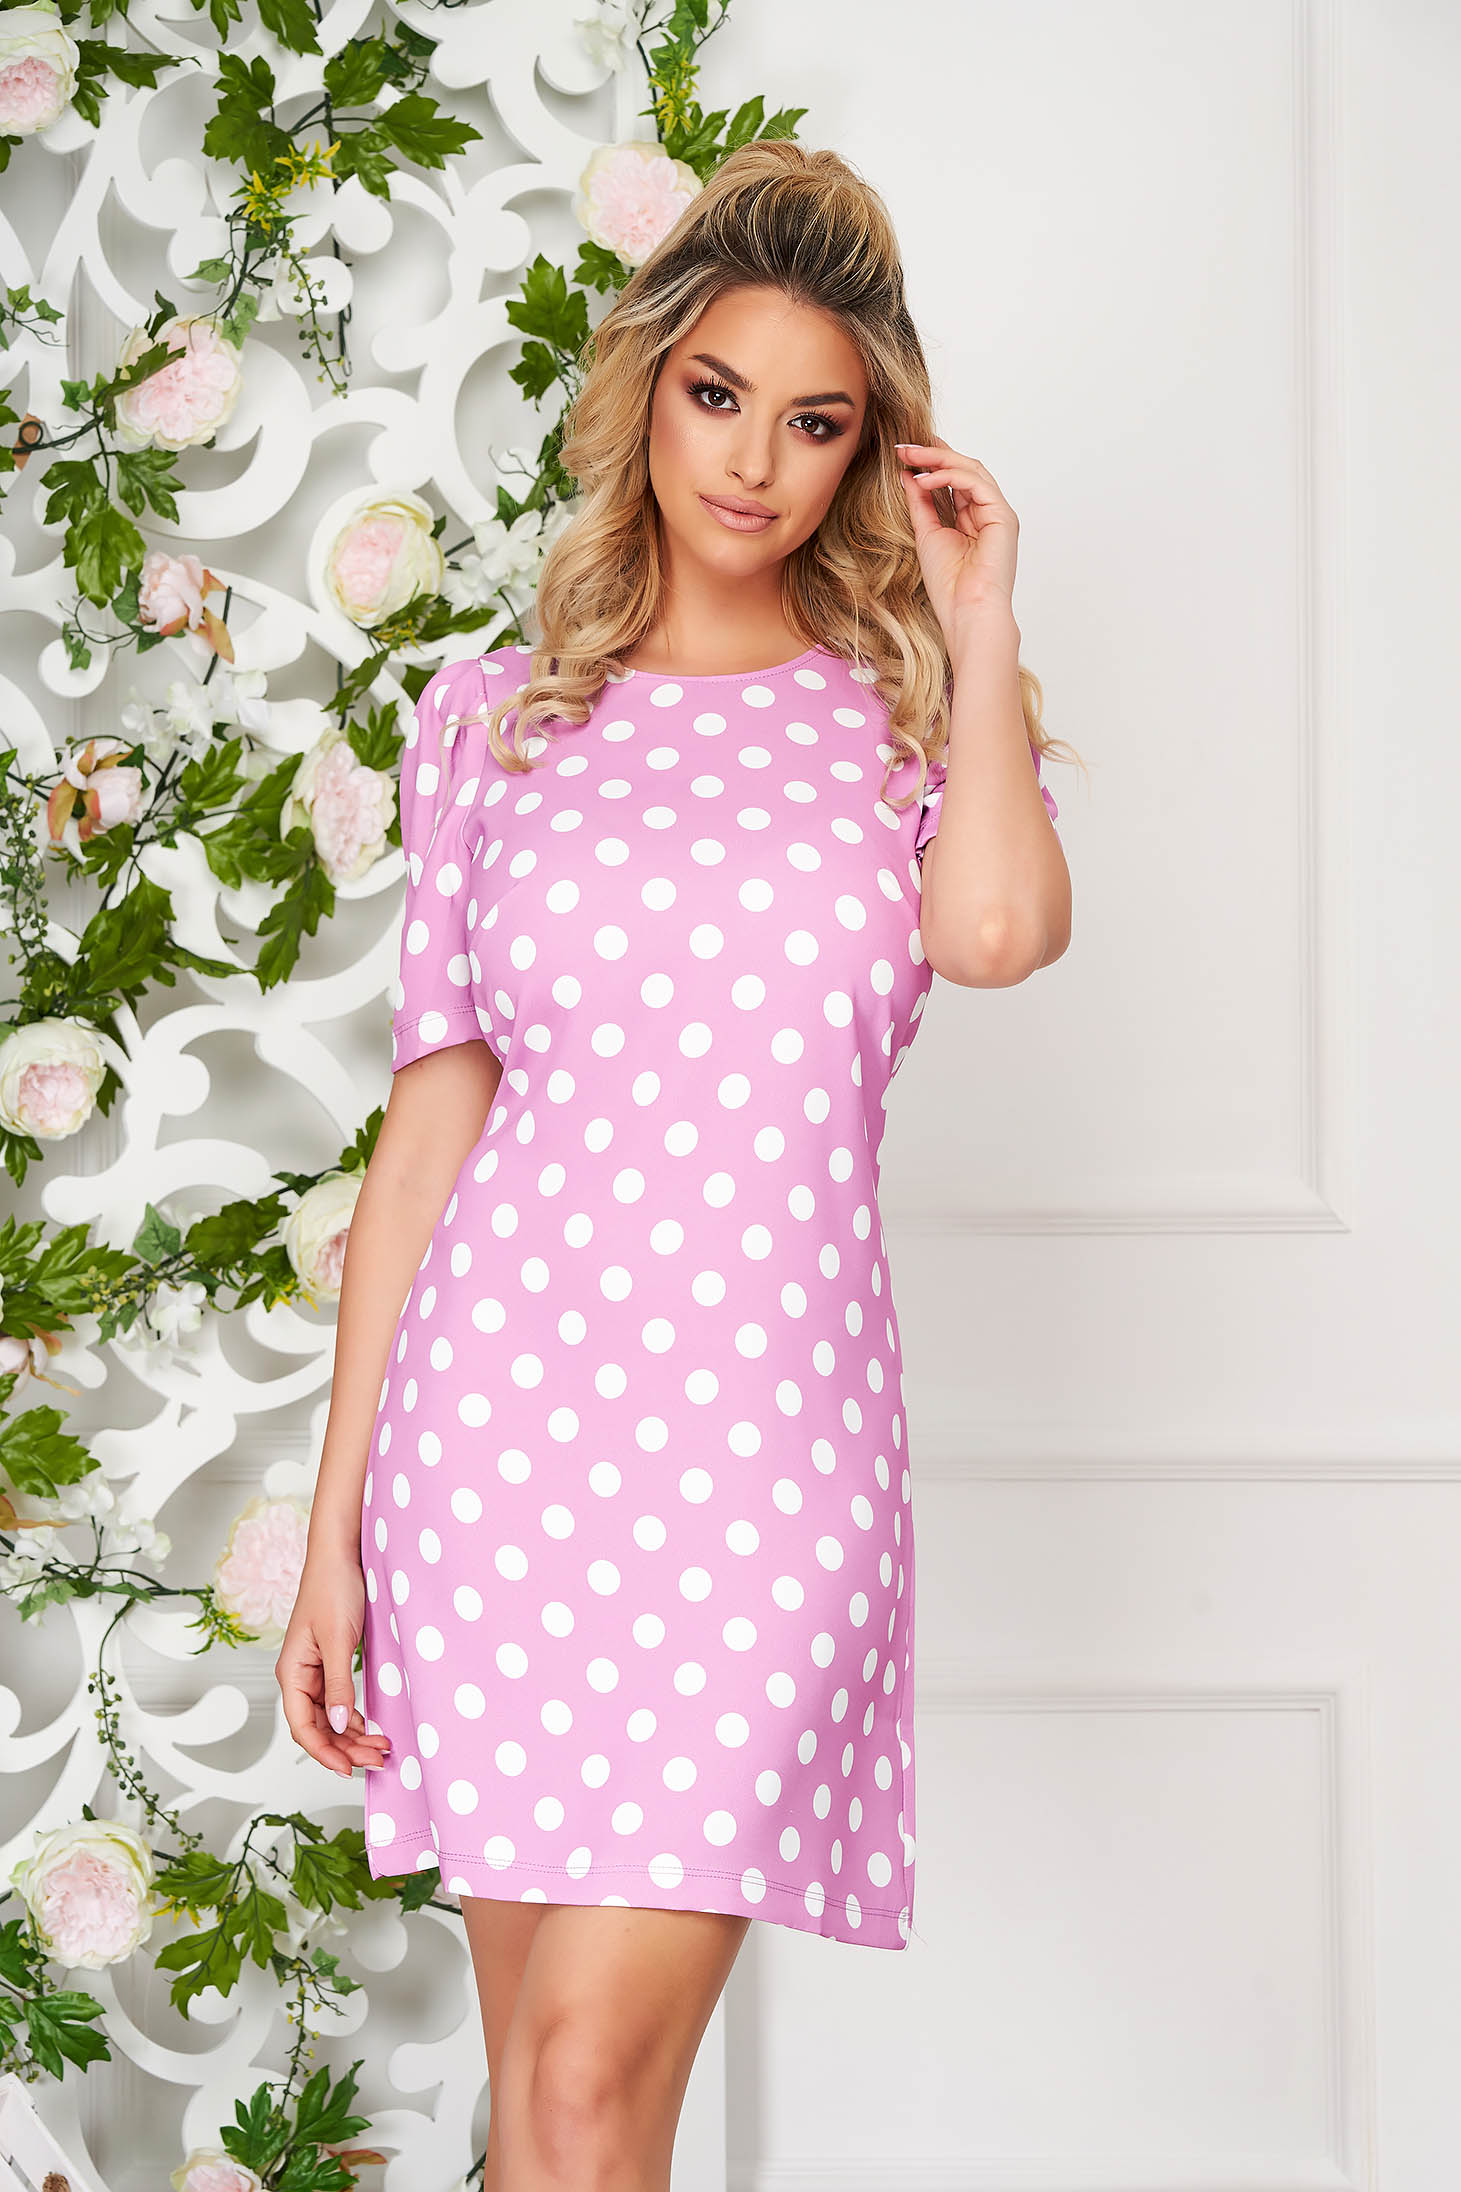 Lightpink dress daily short cut a-line thin fabric high shoulders dots print